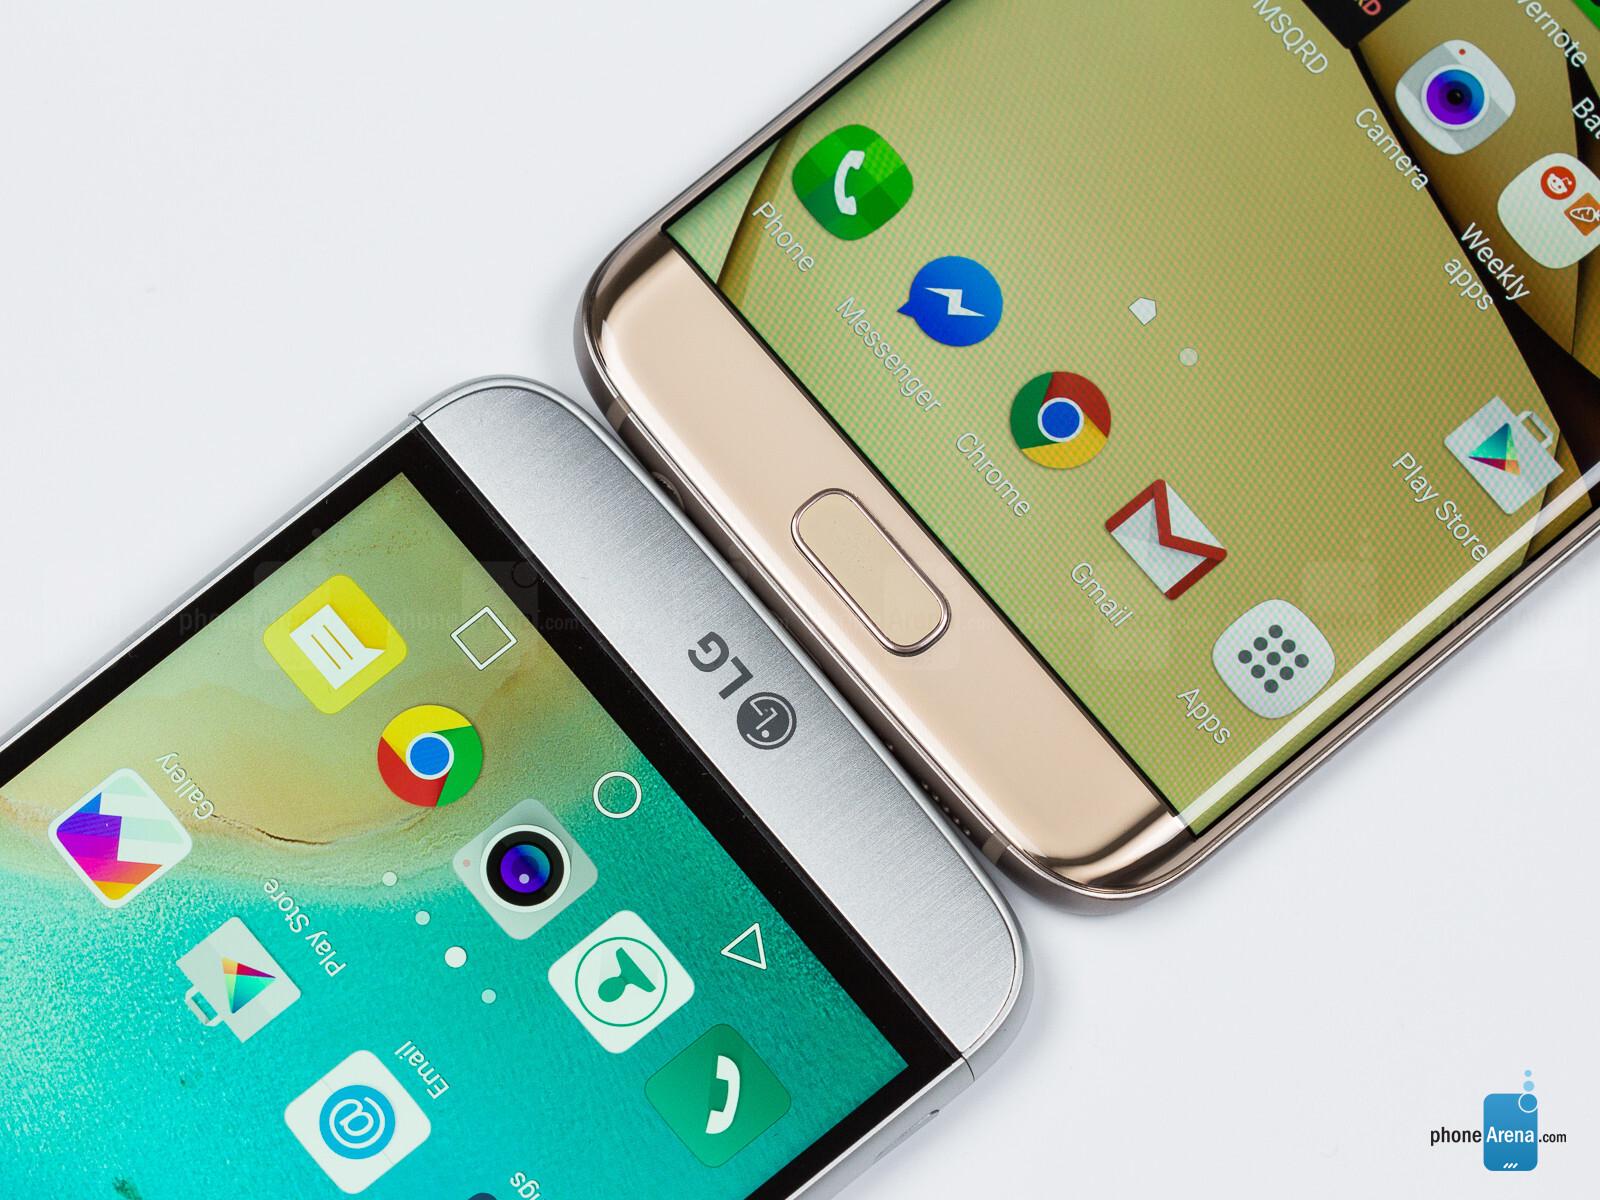 LG G5 vs Samsung Galaxy S7 edge - PhoneArena